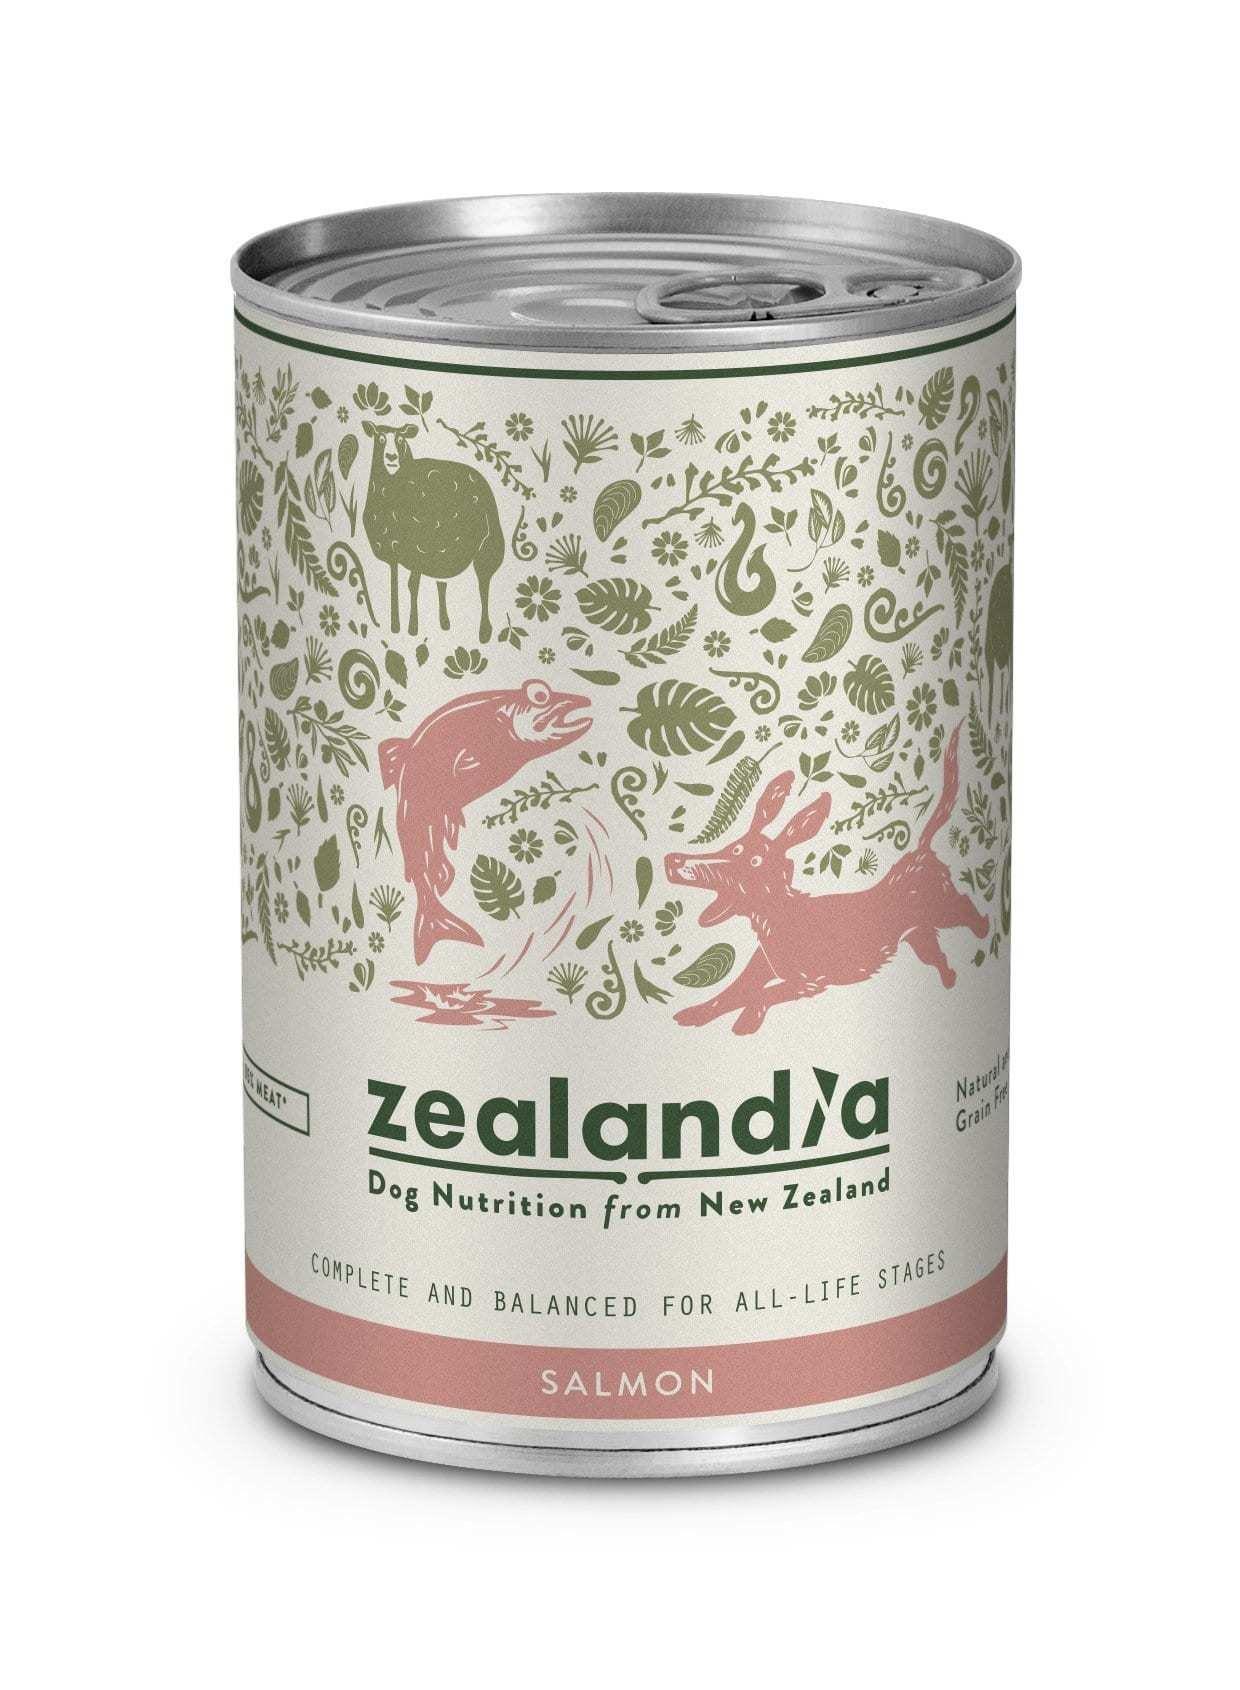 Zealandia Dog NZ Salmon 370g Tinned Dog Food zealandia-dog-salmon-370g-tin